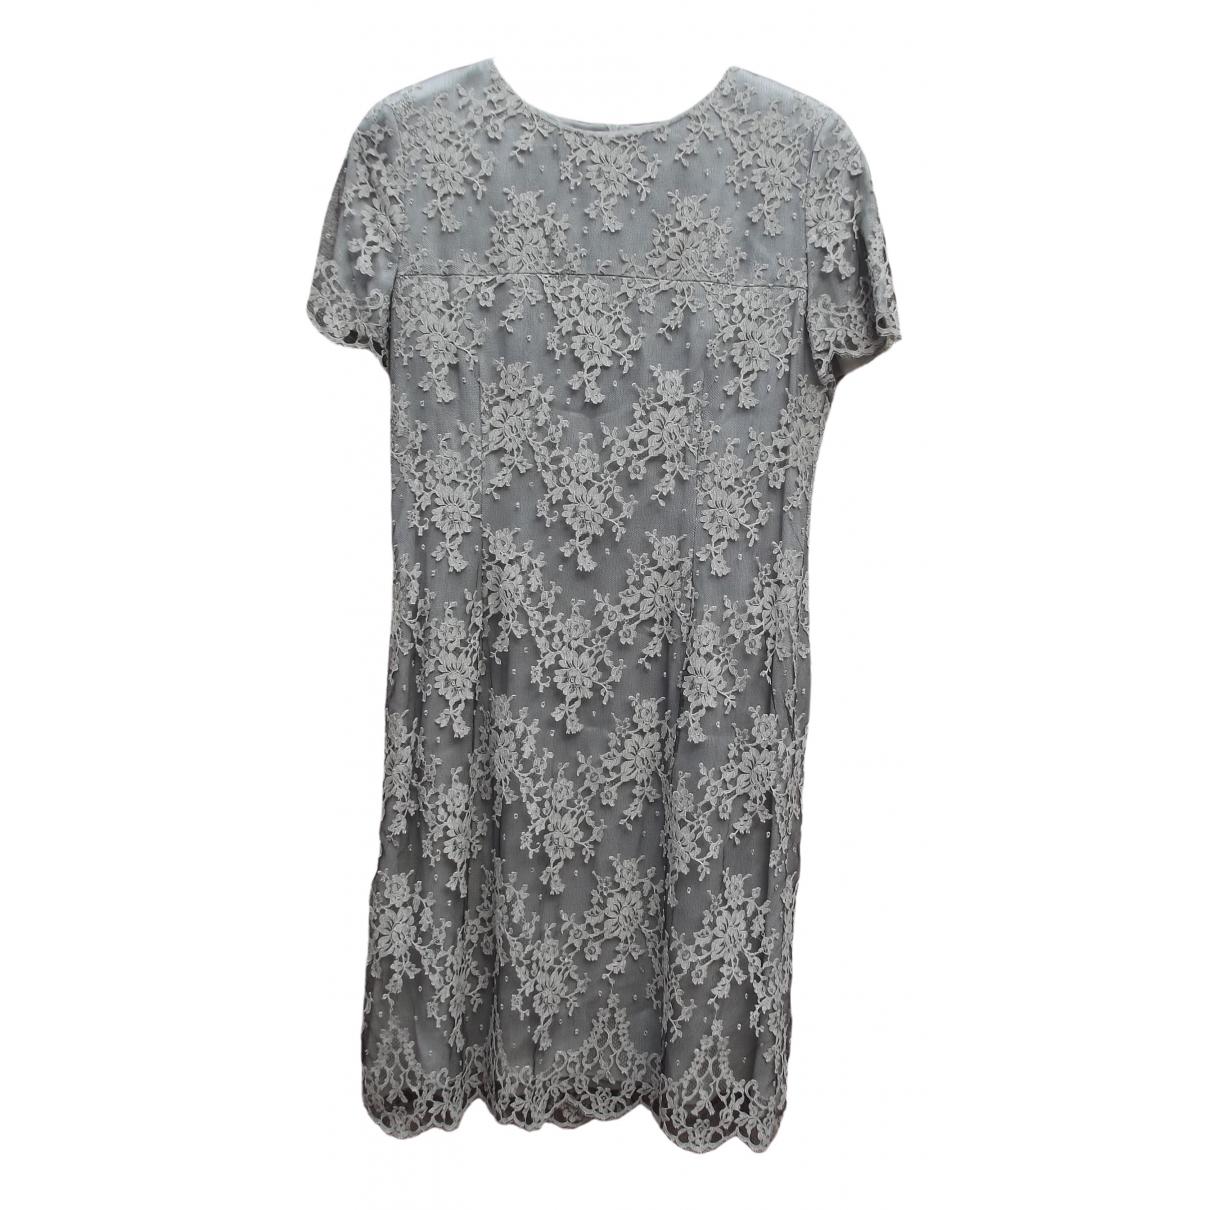 Valentino Garavani \N Grey Lace dress for Women 46 IT